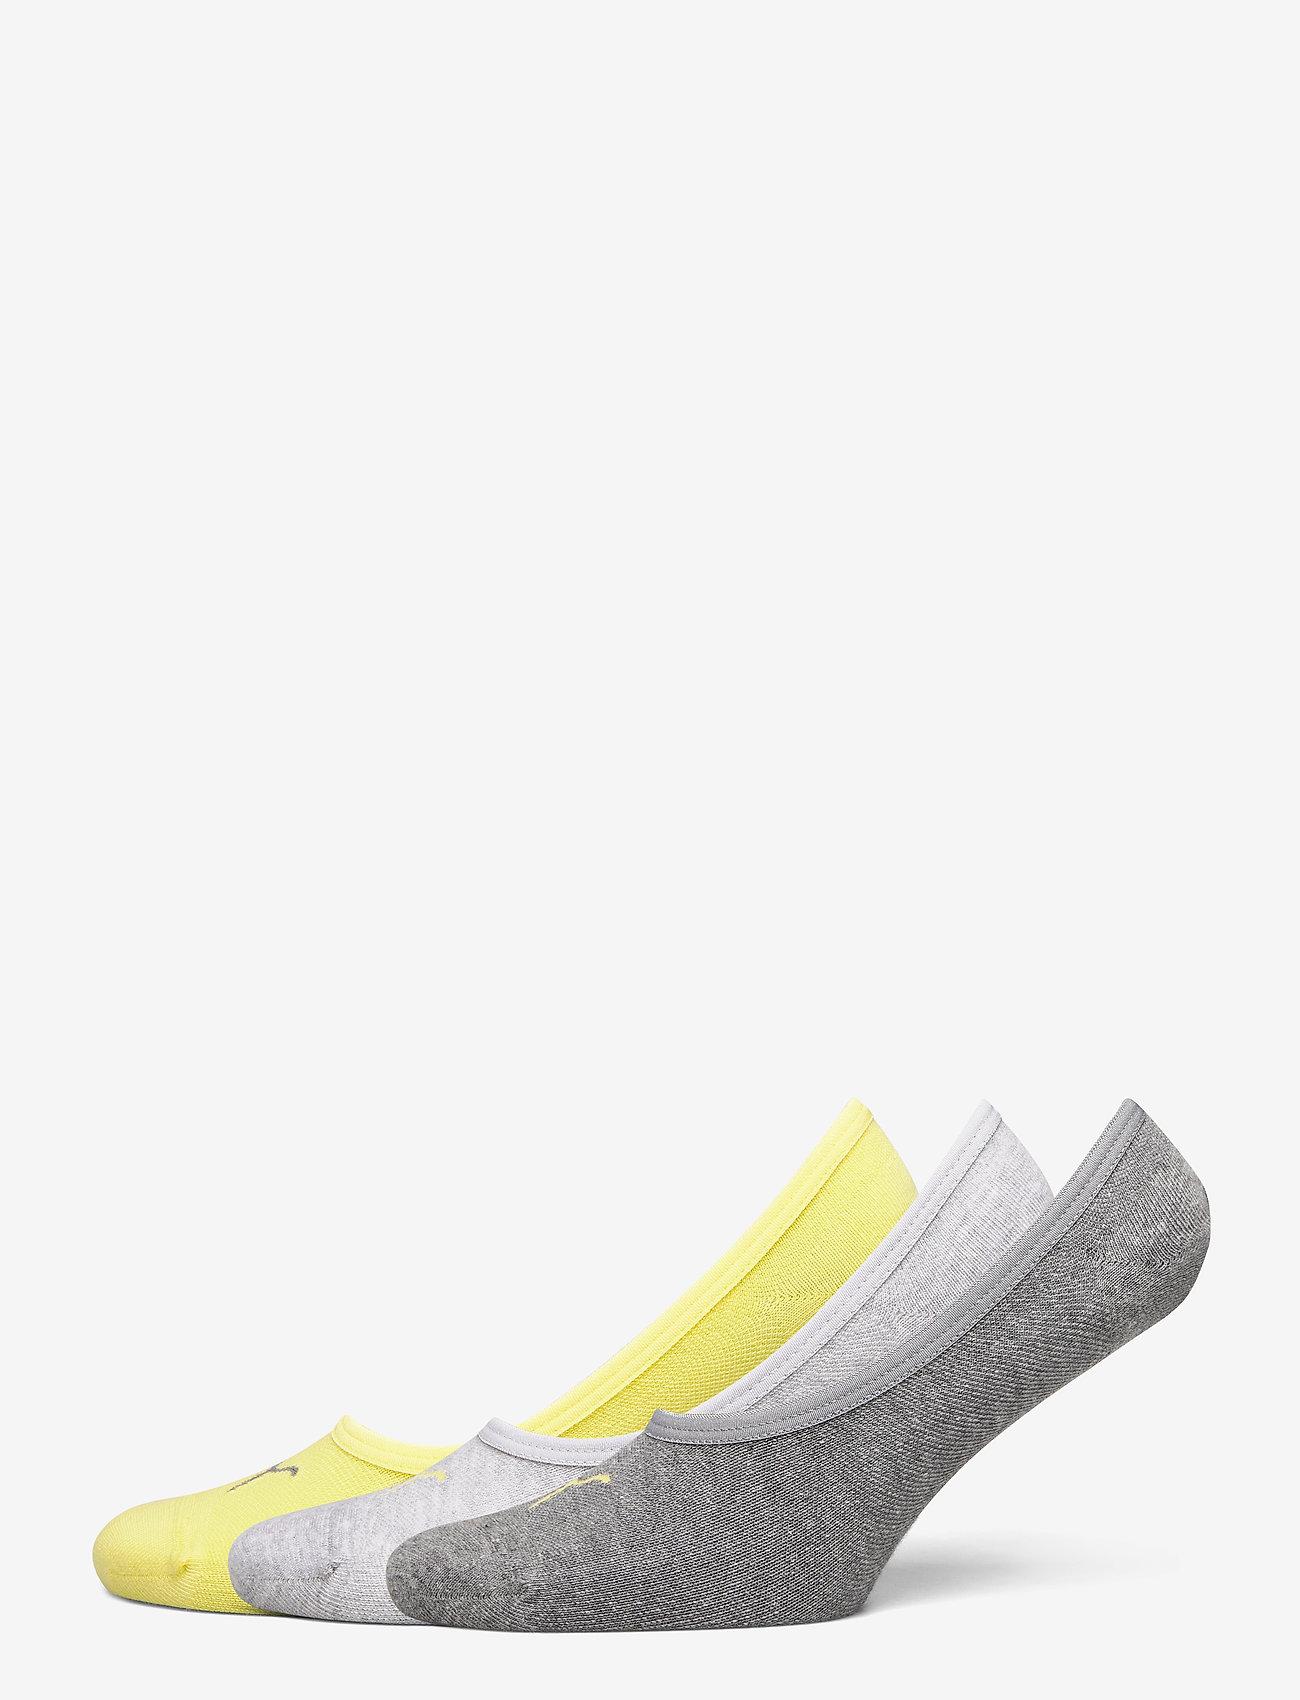 PUMA - PUMA FOOTIE 3P UNISEX - kousen - yellow - 0